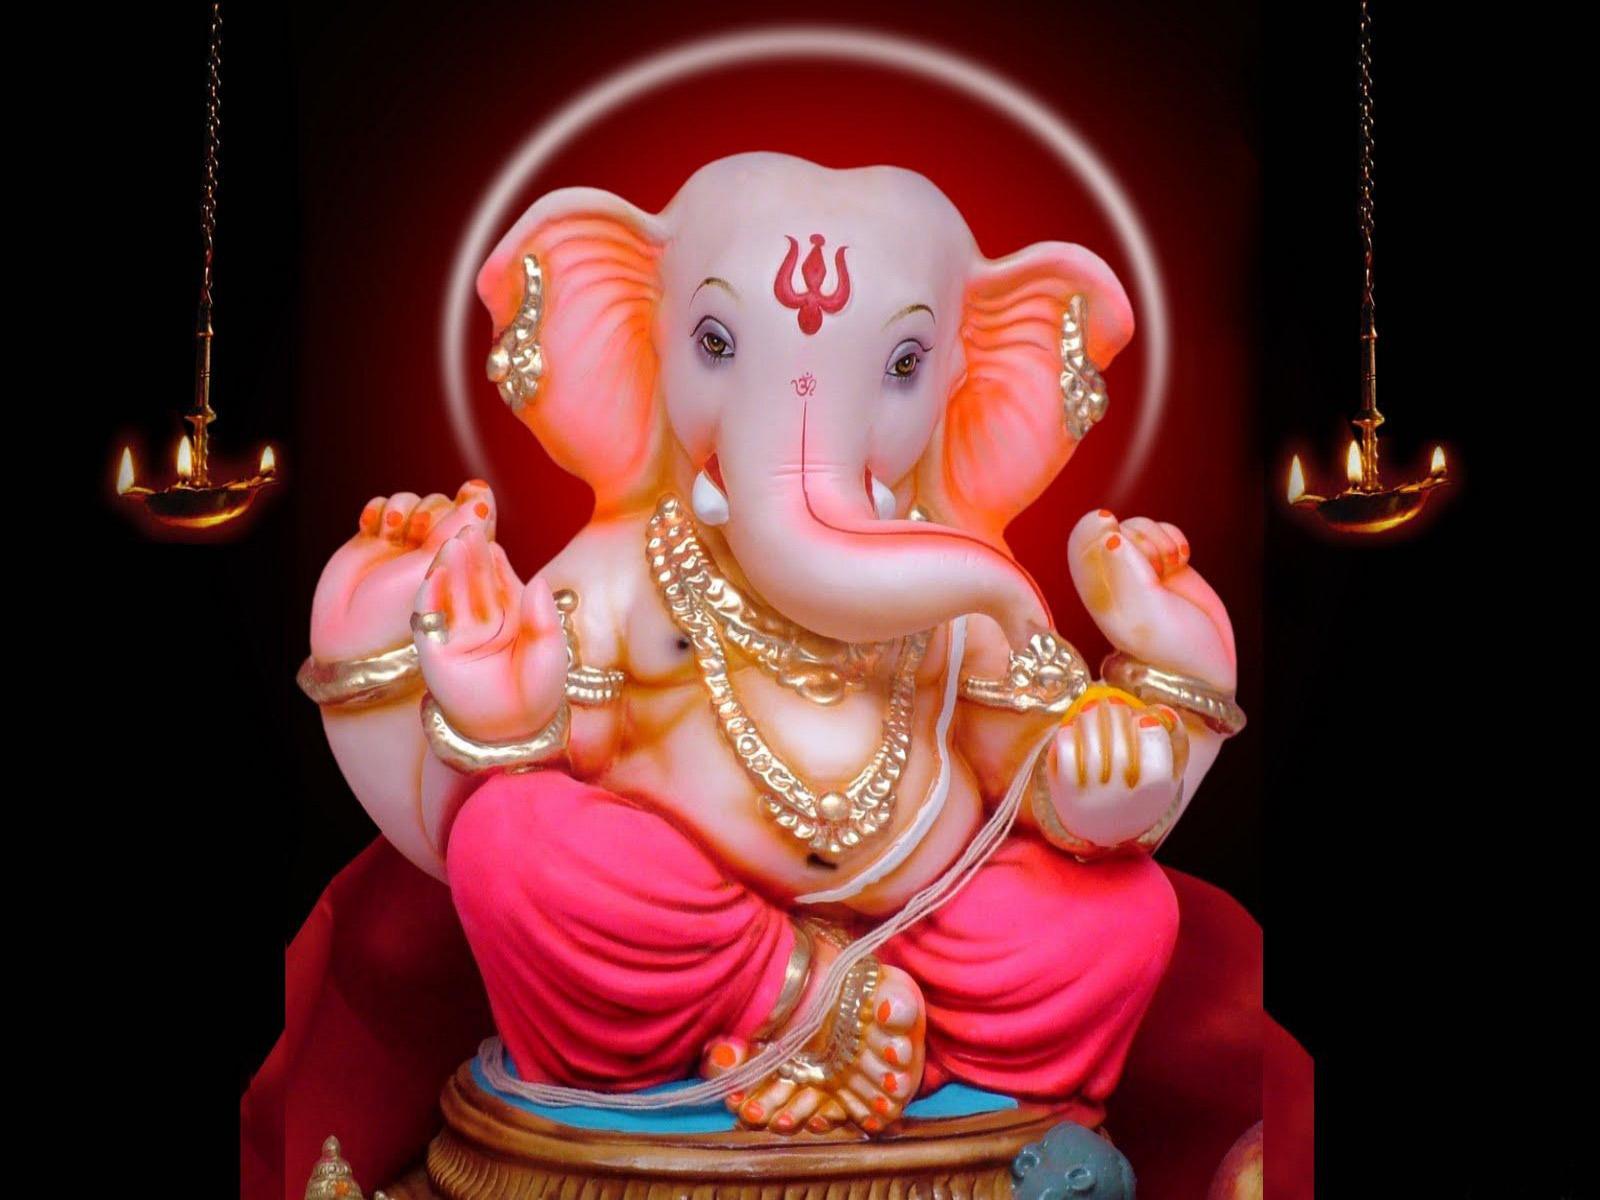 Wallpaper download ganesh - Ganesh Ji Hd Image Daily Pics Update Hd Wallpapers Download